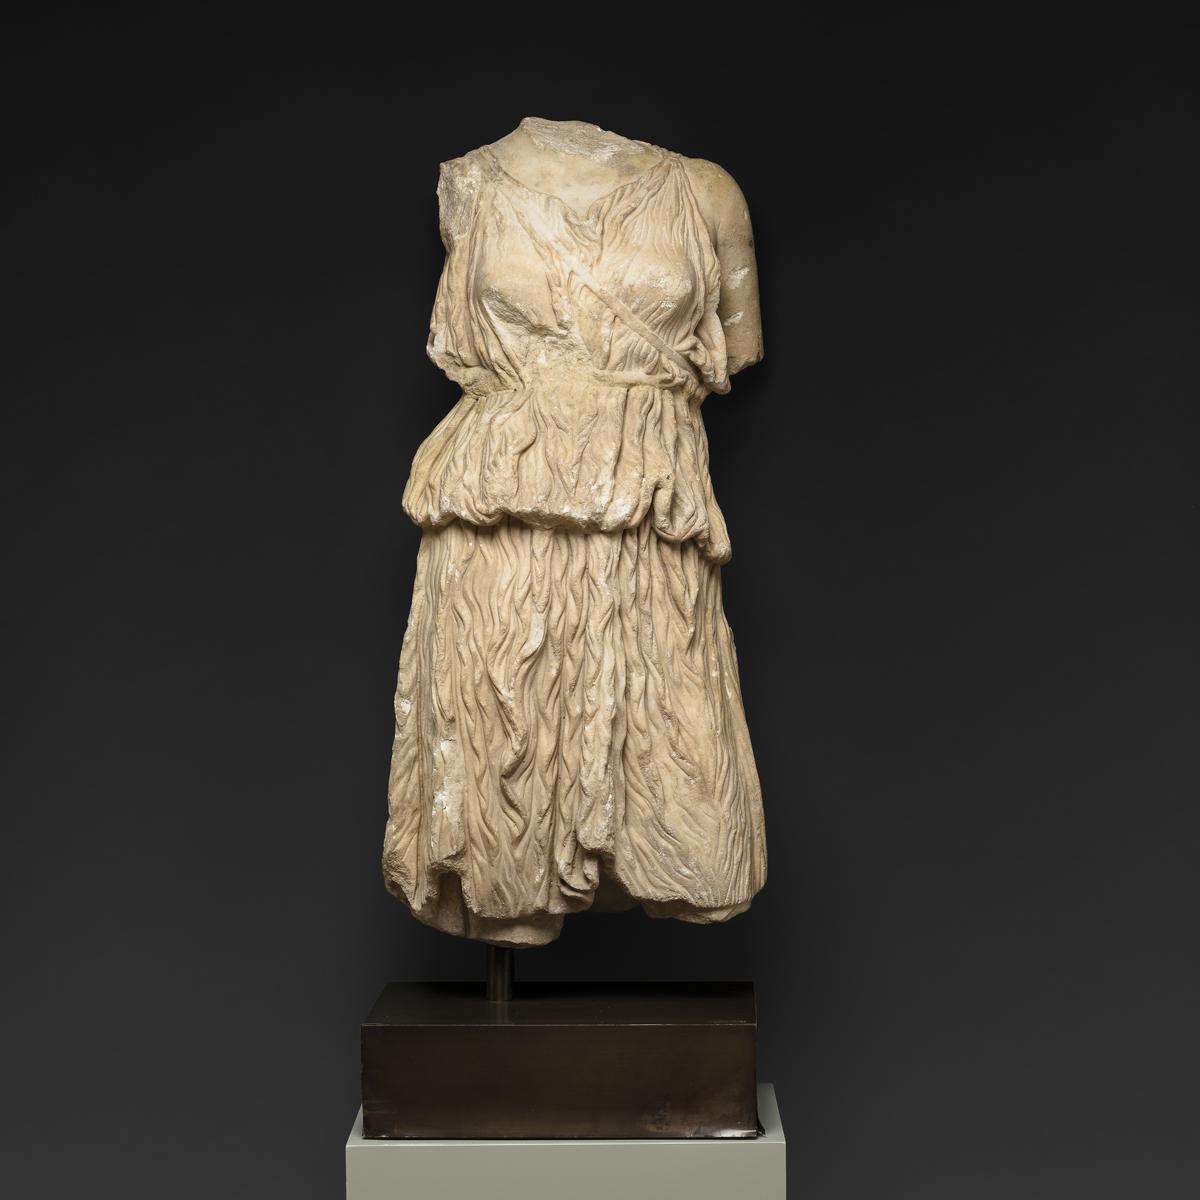 Roman Marble Torso of the Goddess Diana - Barakat Gallery